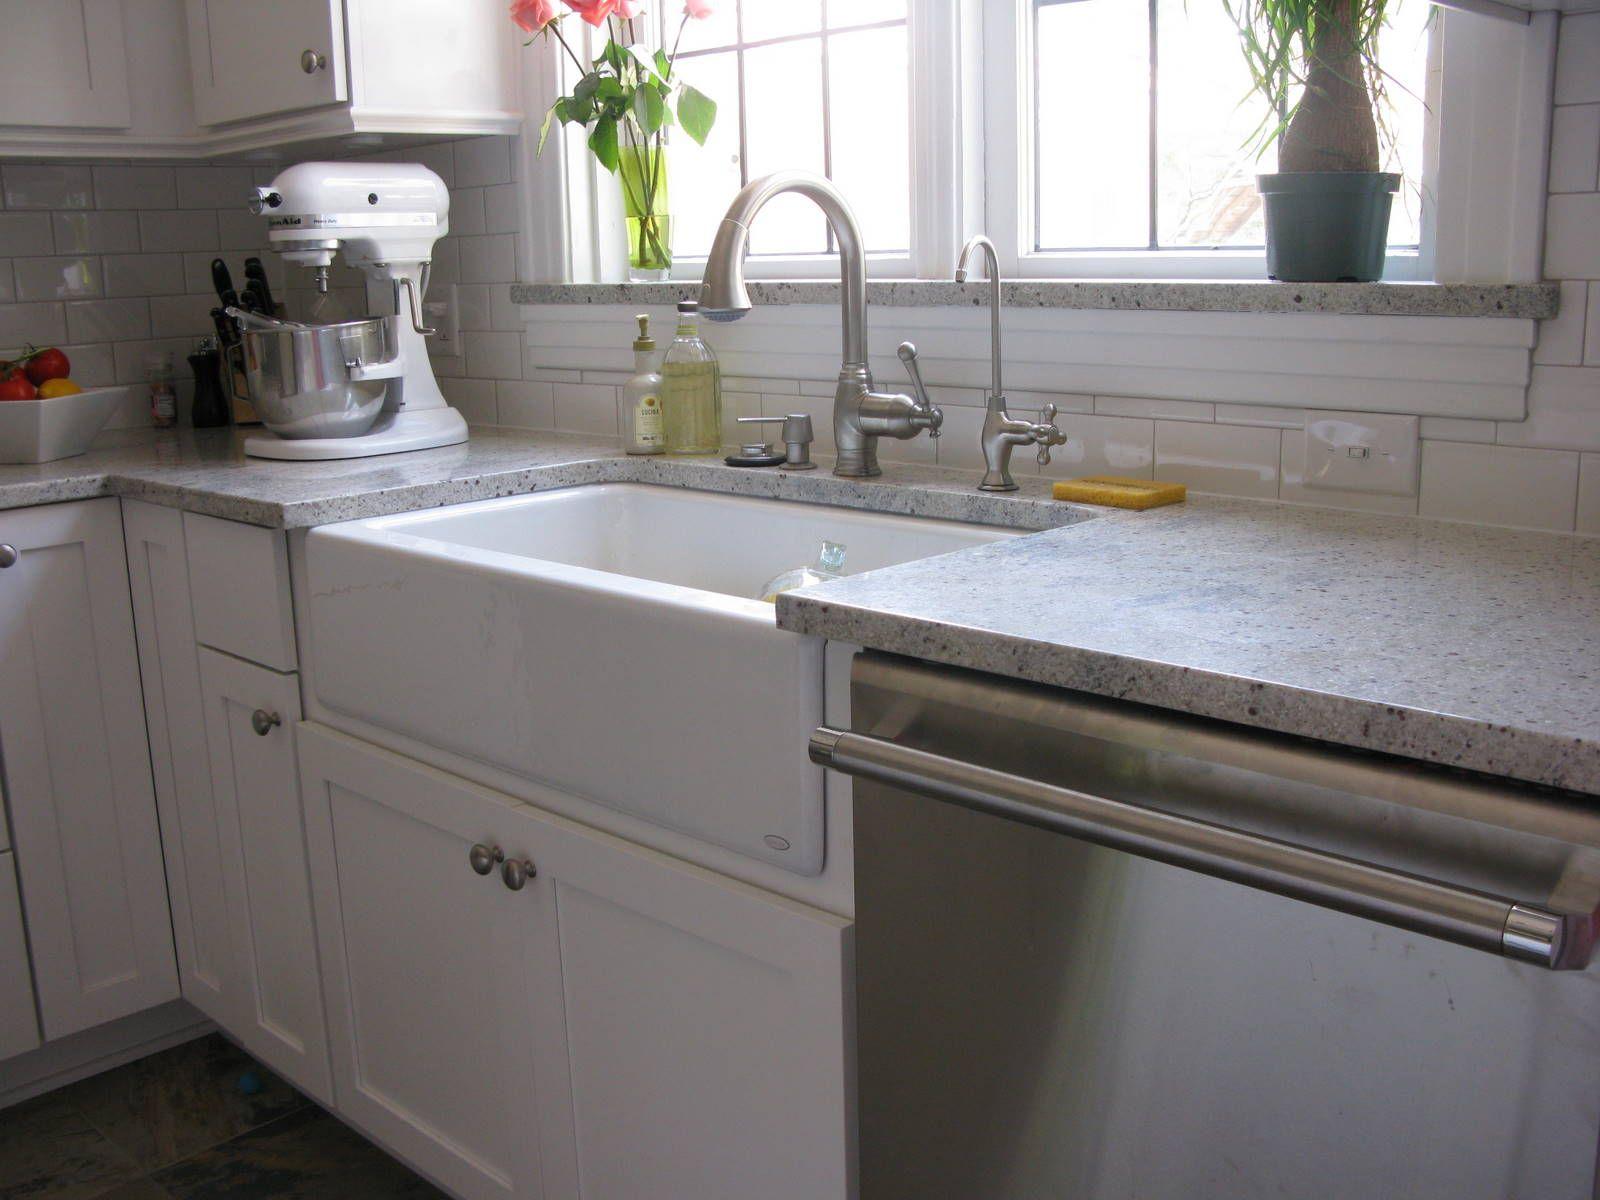 Kitchen With Apron Sink : apron sink Kitchen Ideas Pinterest